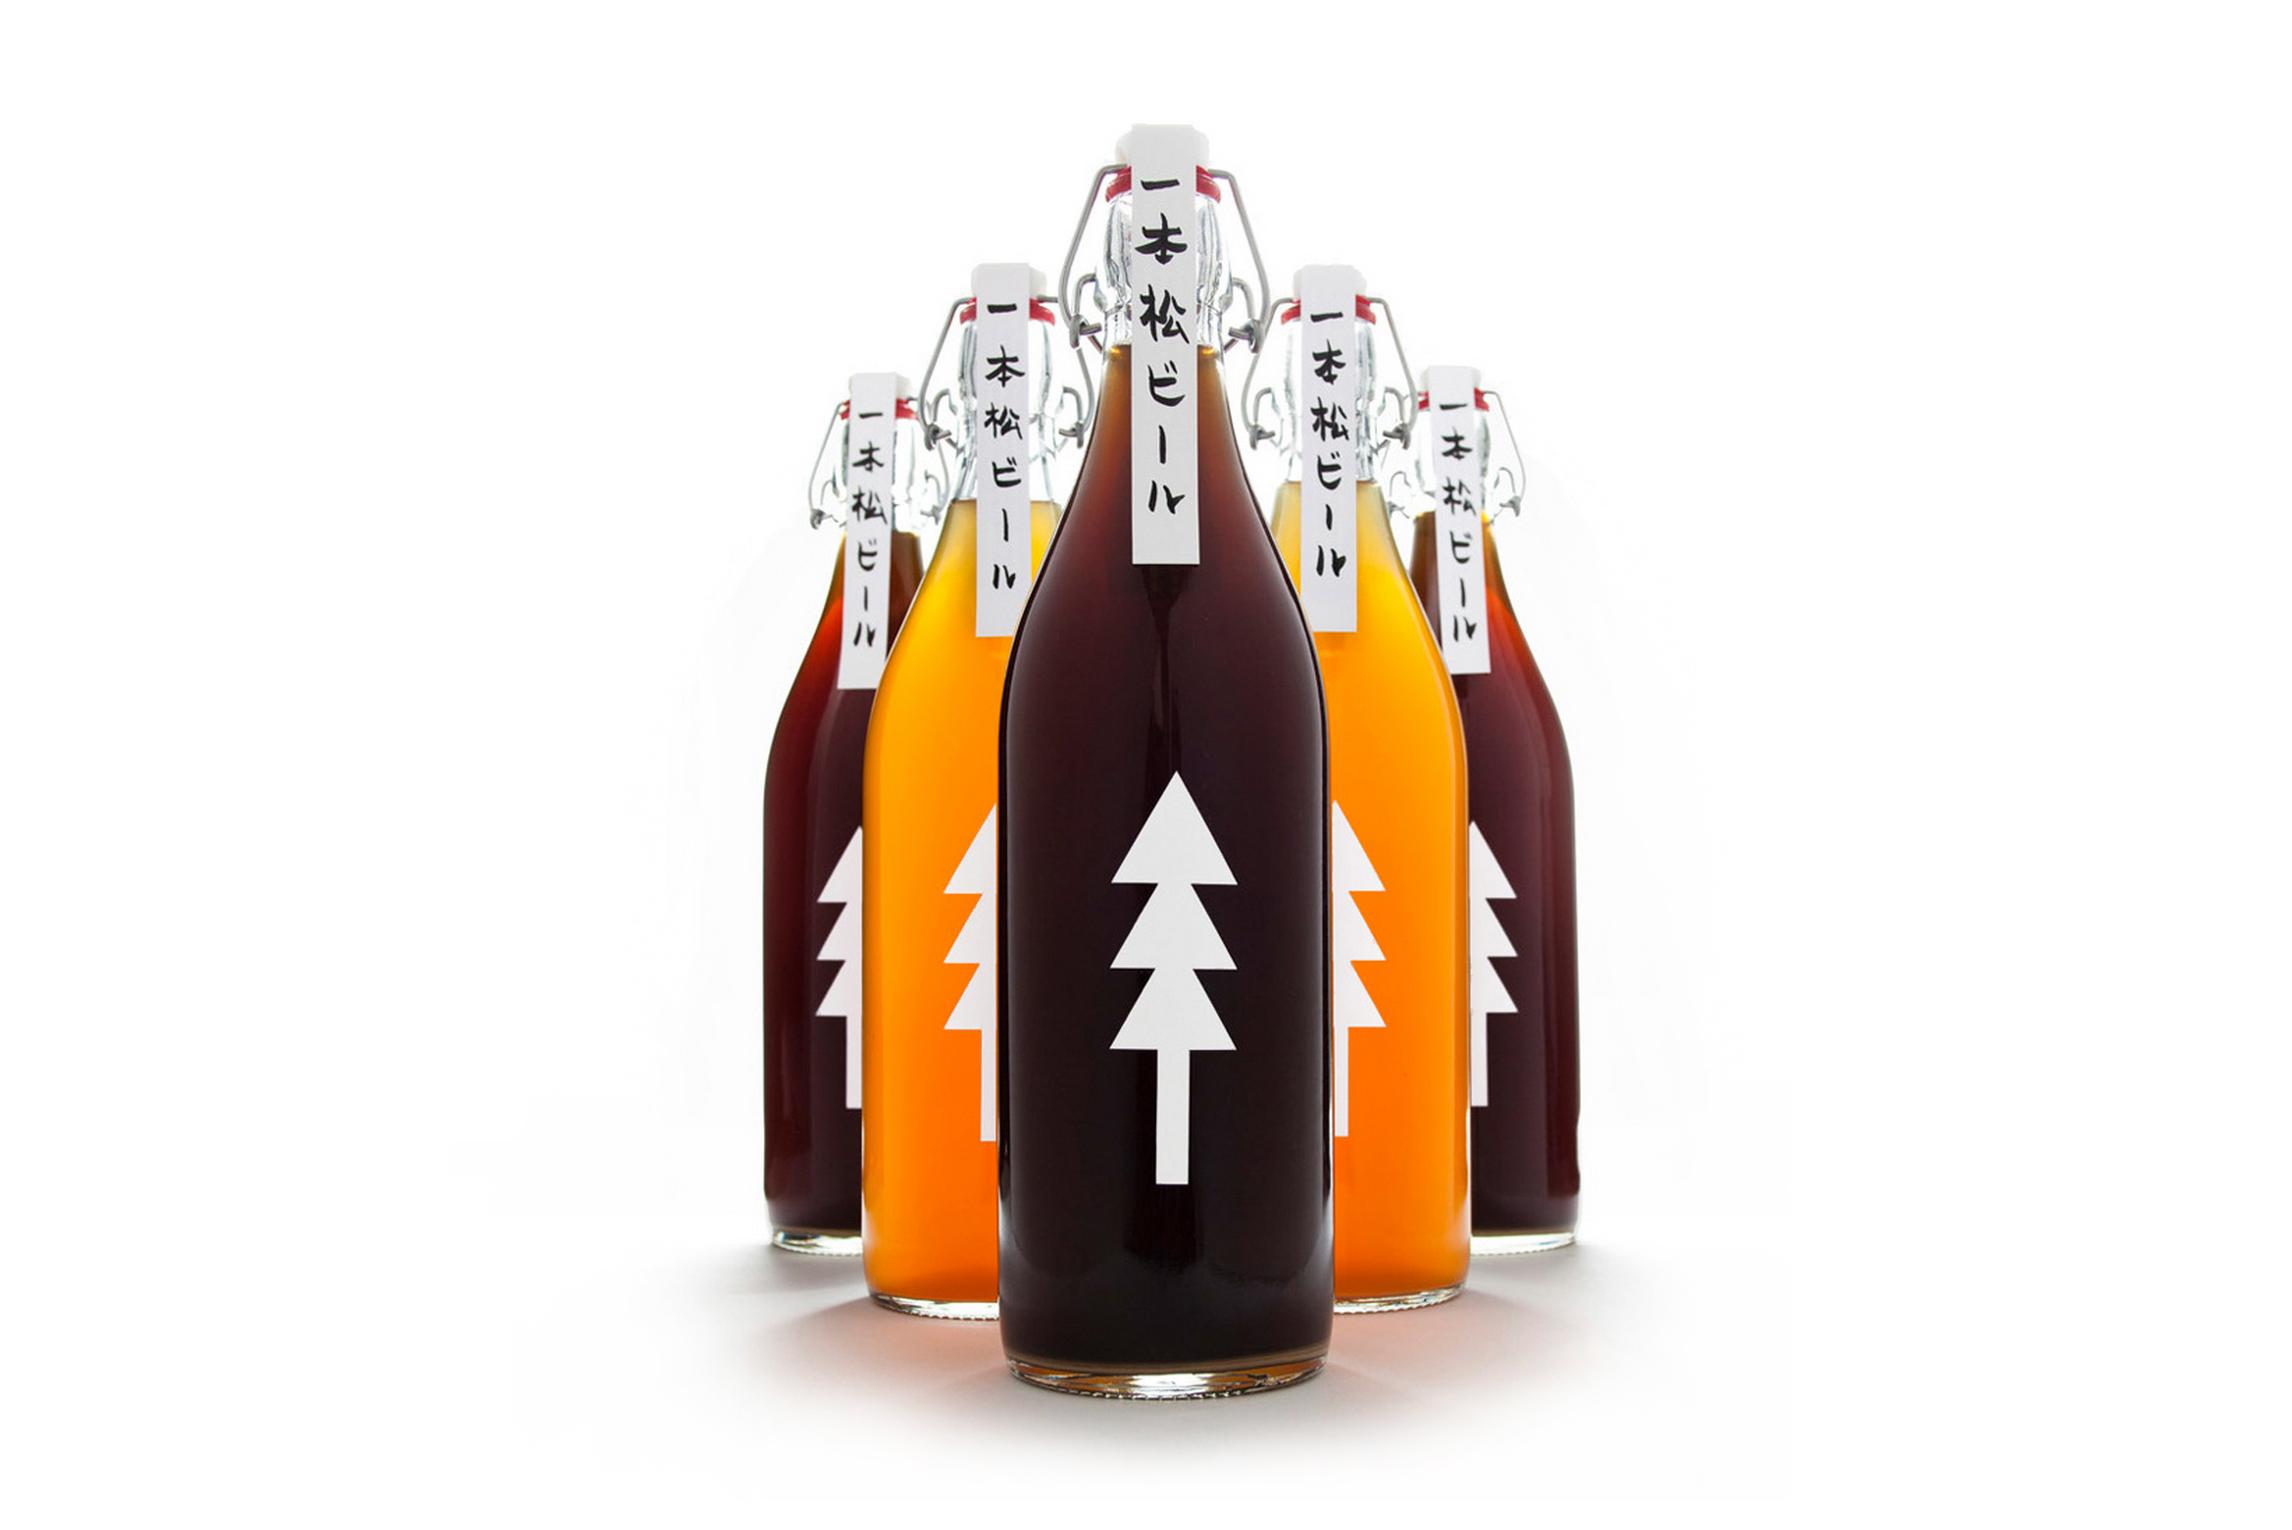 Cerveza Ippon Matsu packaging rubia negra